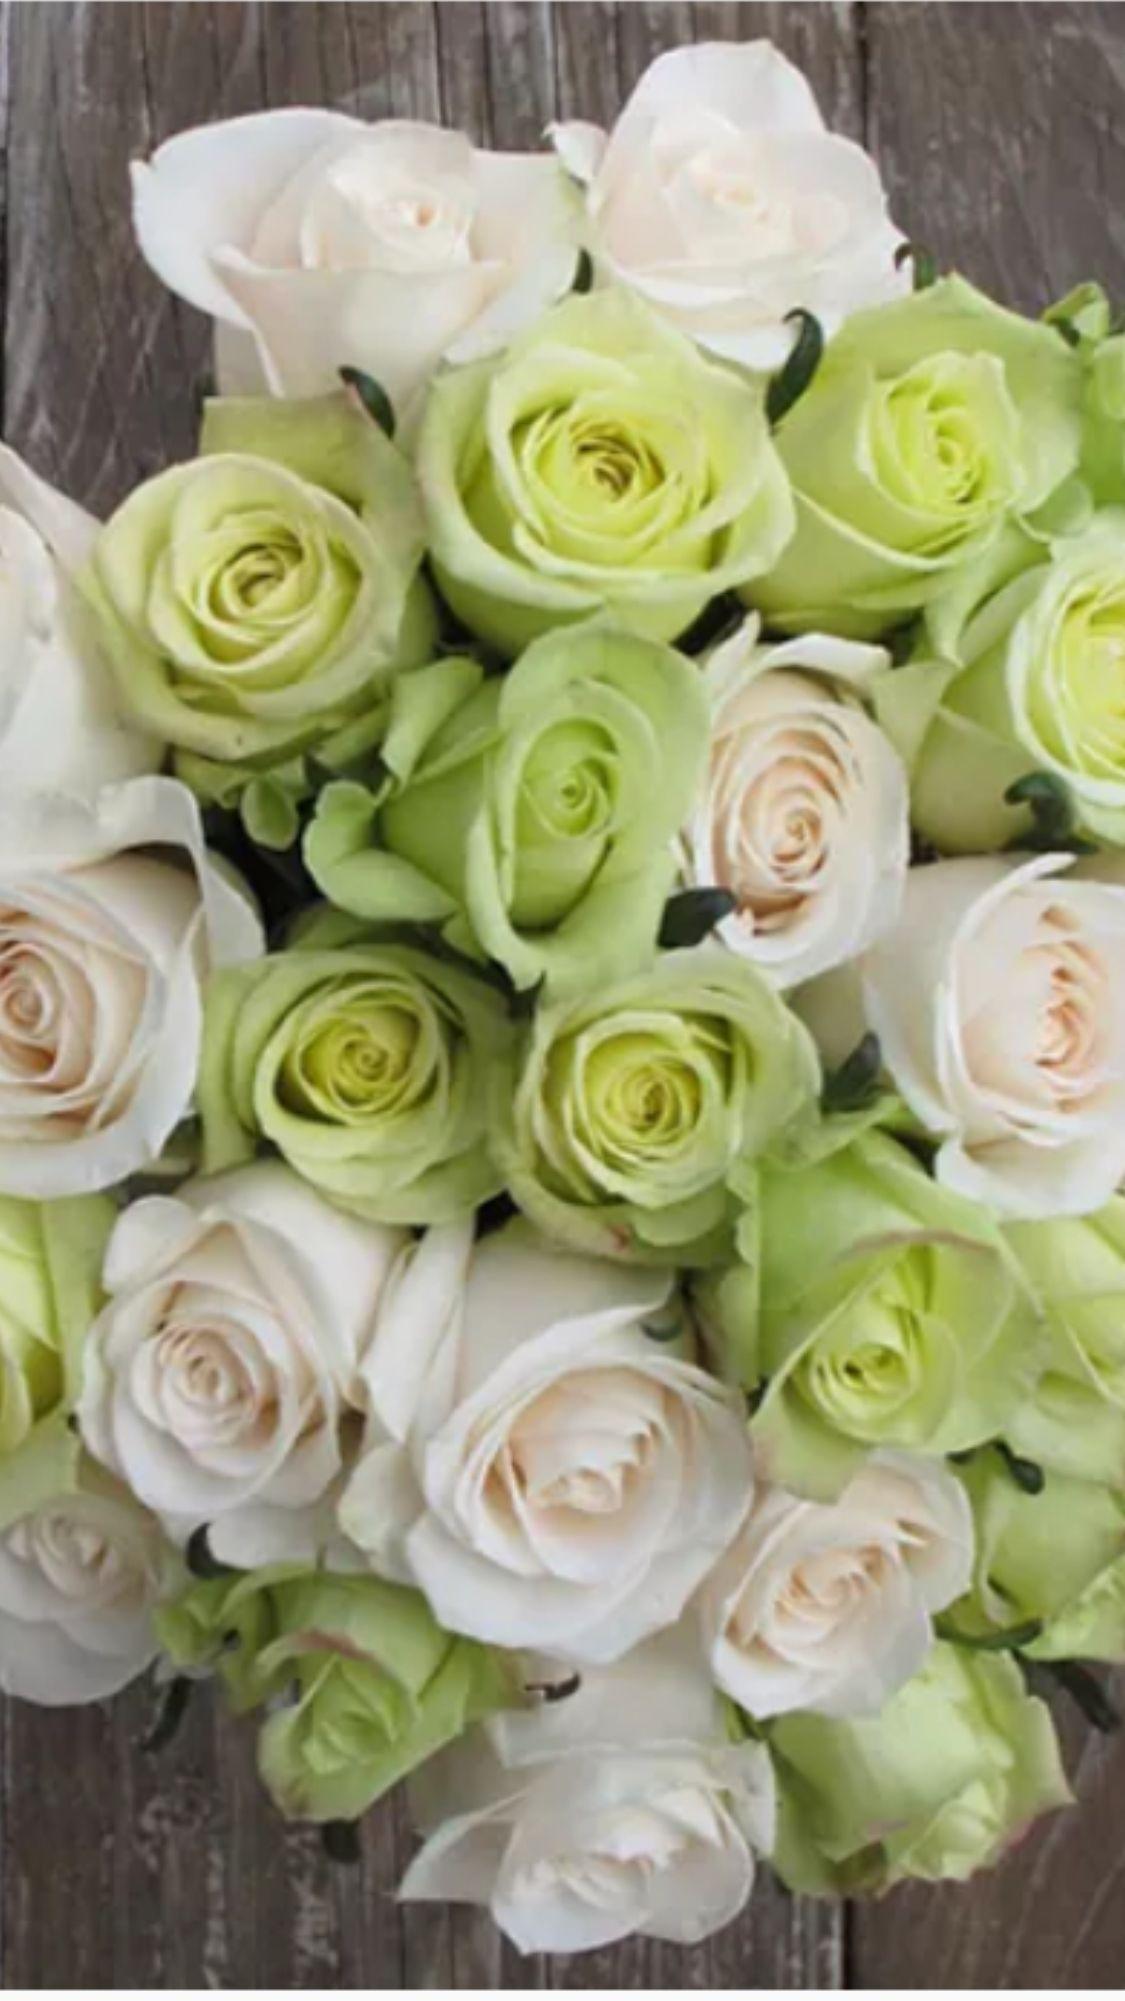 Bouquet ideas in my color scheme!